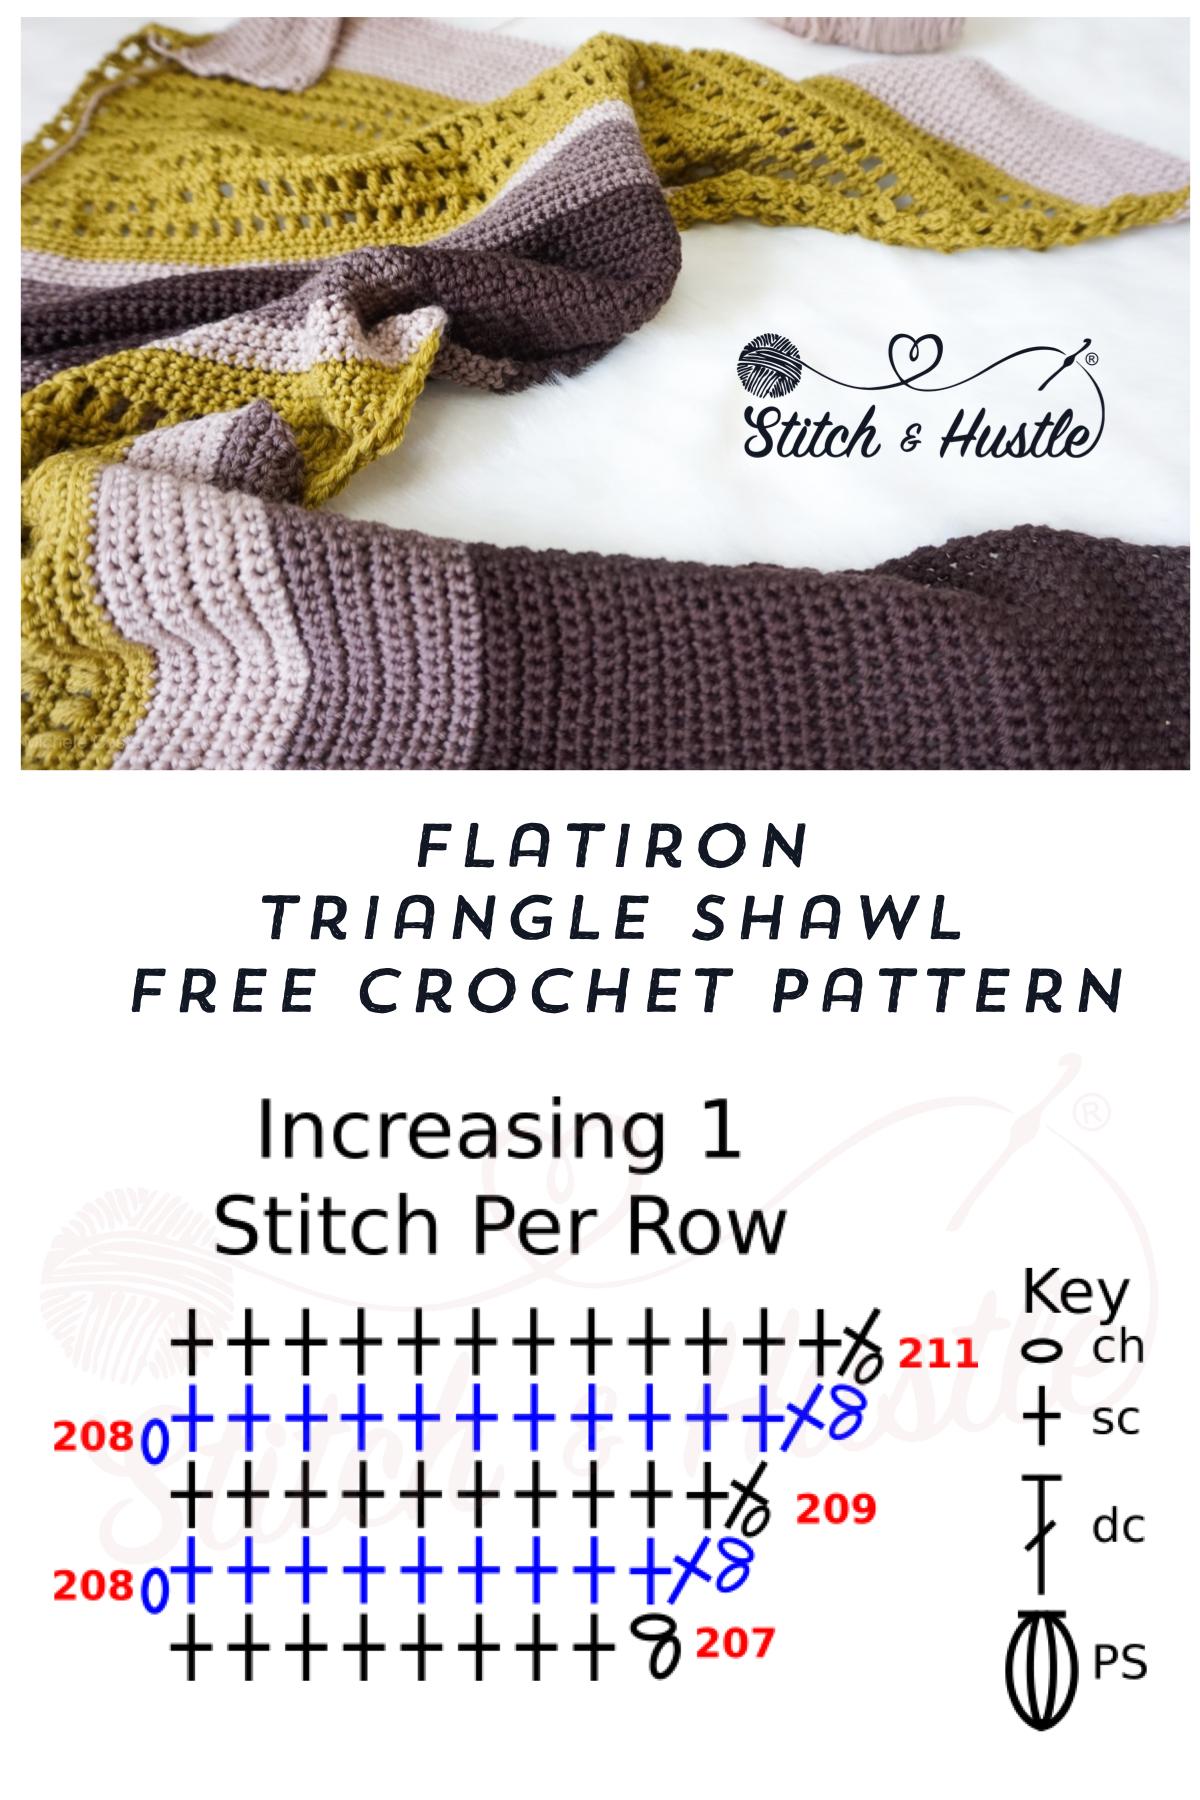 Flatiron_shawl_asymmetrical_triangle_shawl_free_crochet-pattern-chart-3.jpg